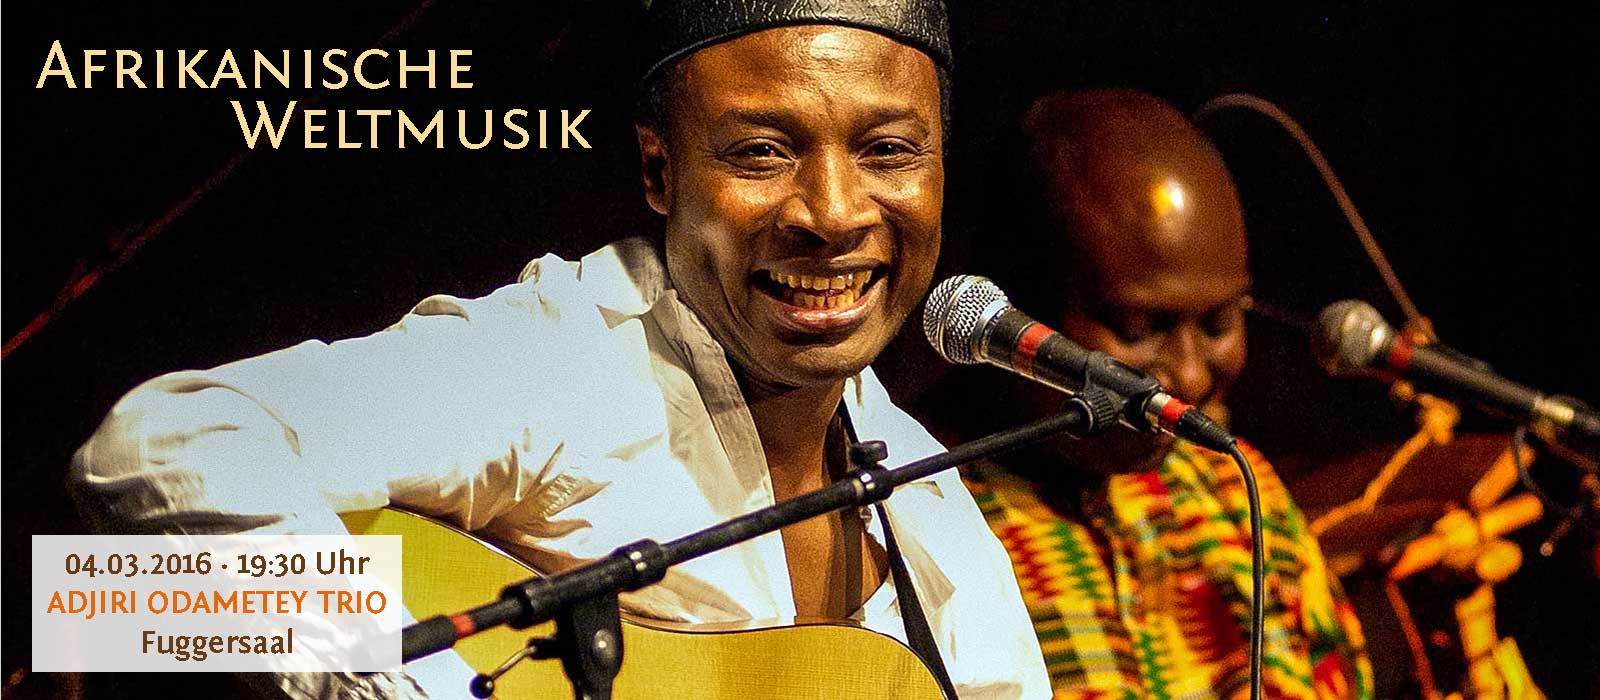 ADJIRI ODAMETEY TRIO – Afrikanische Weltmusik